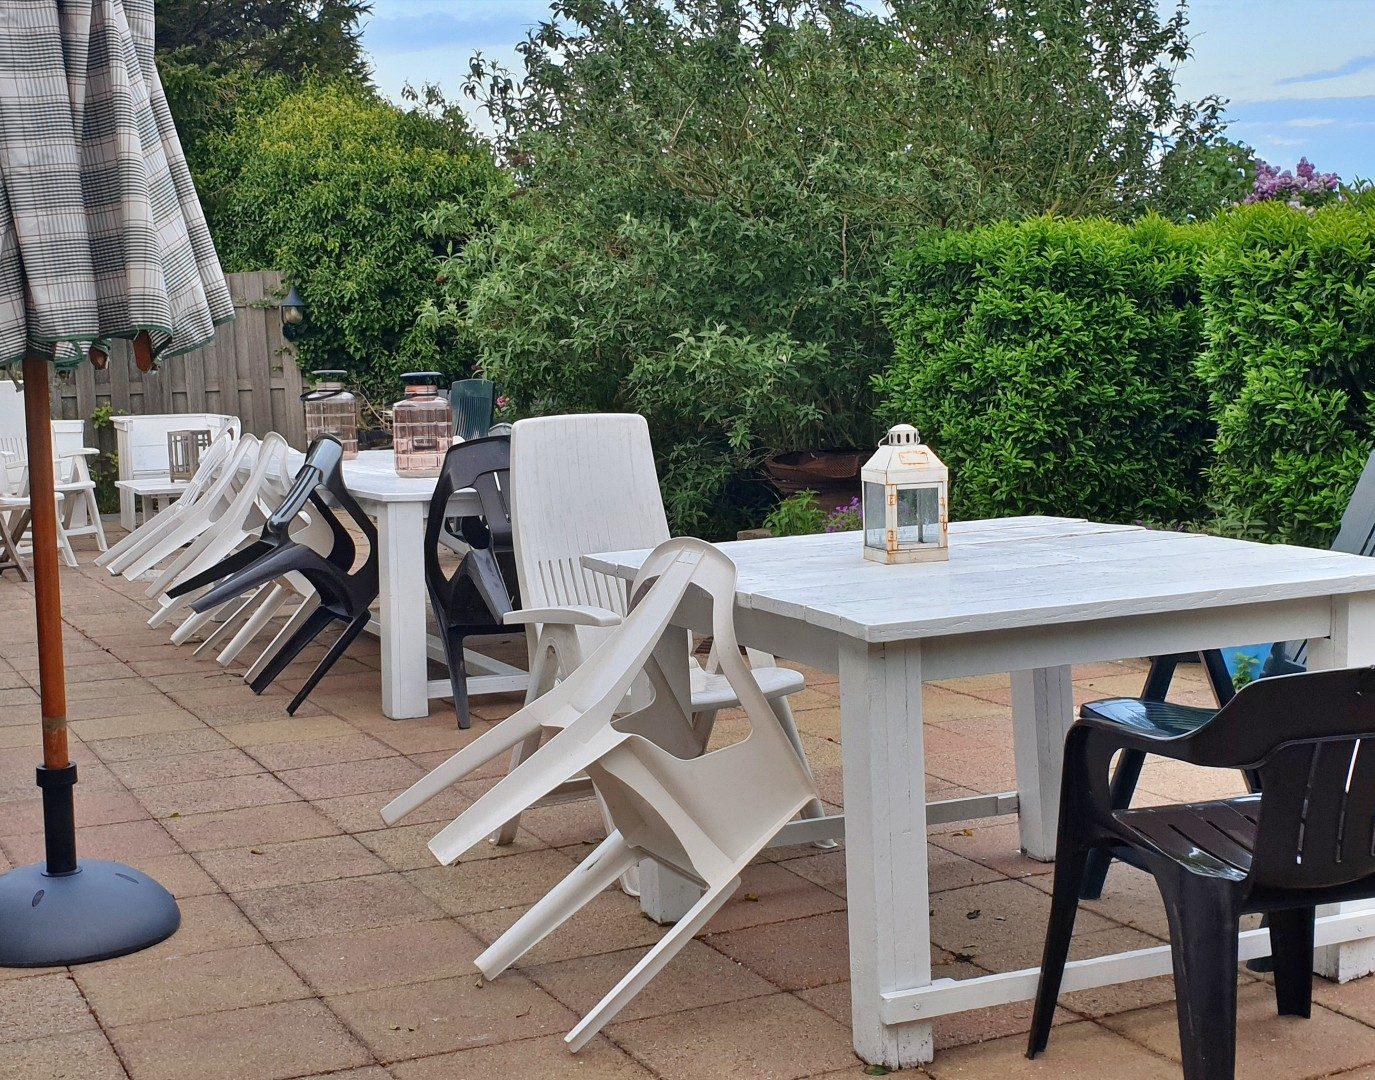 achtertuin terrasje vakantiehuis bedandbreakfast hotel lanormande-10